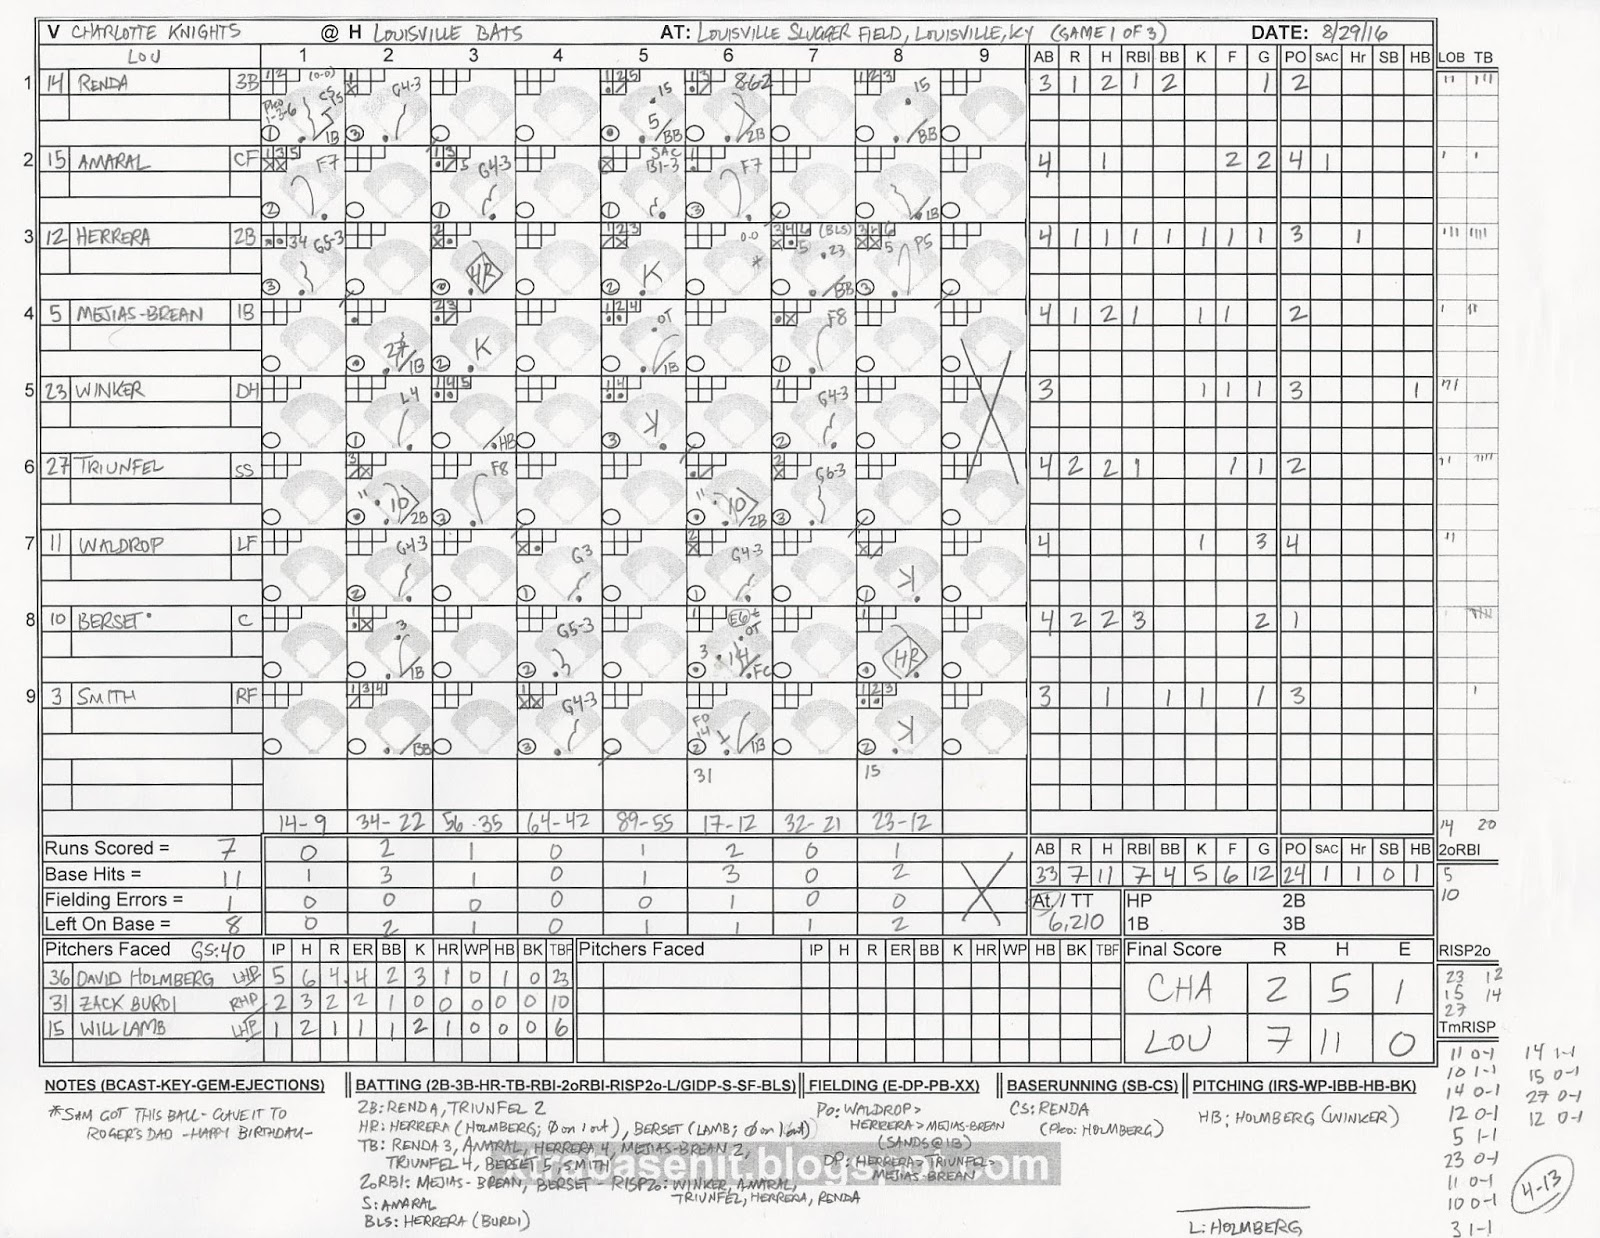 The Baseball Enthusiast: 8/29/2016 Charlotte Knights 2